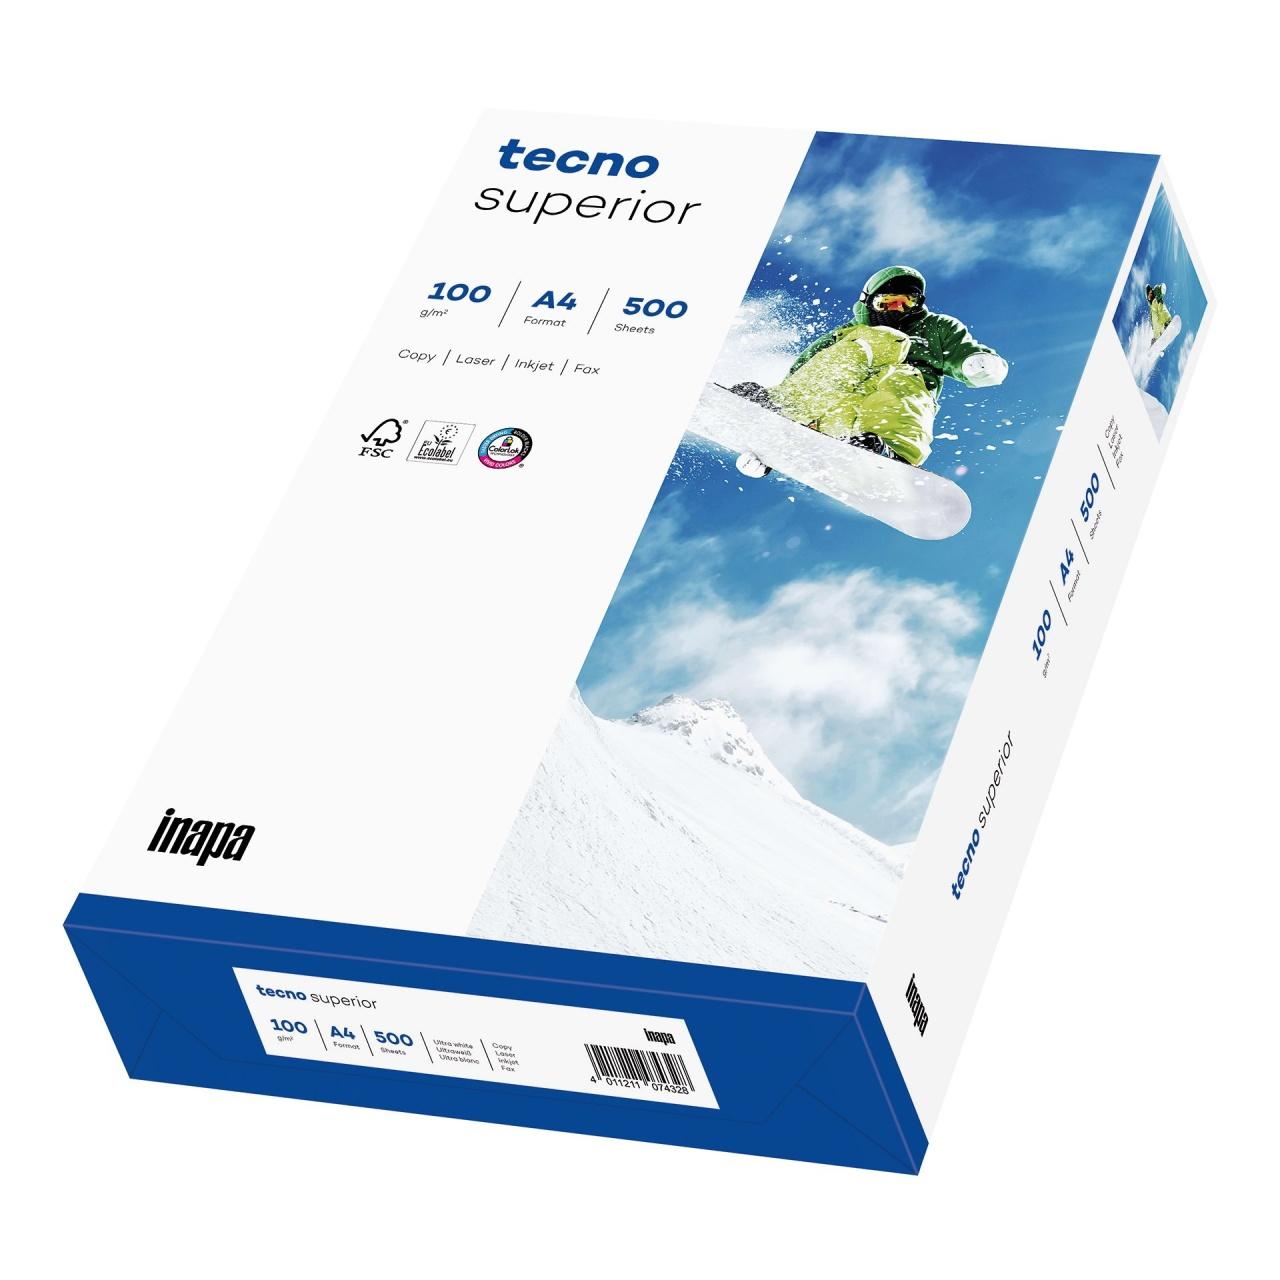 Plano Superior FSC Druckerpapier 100 g/m², DIN A4